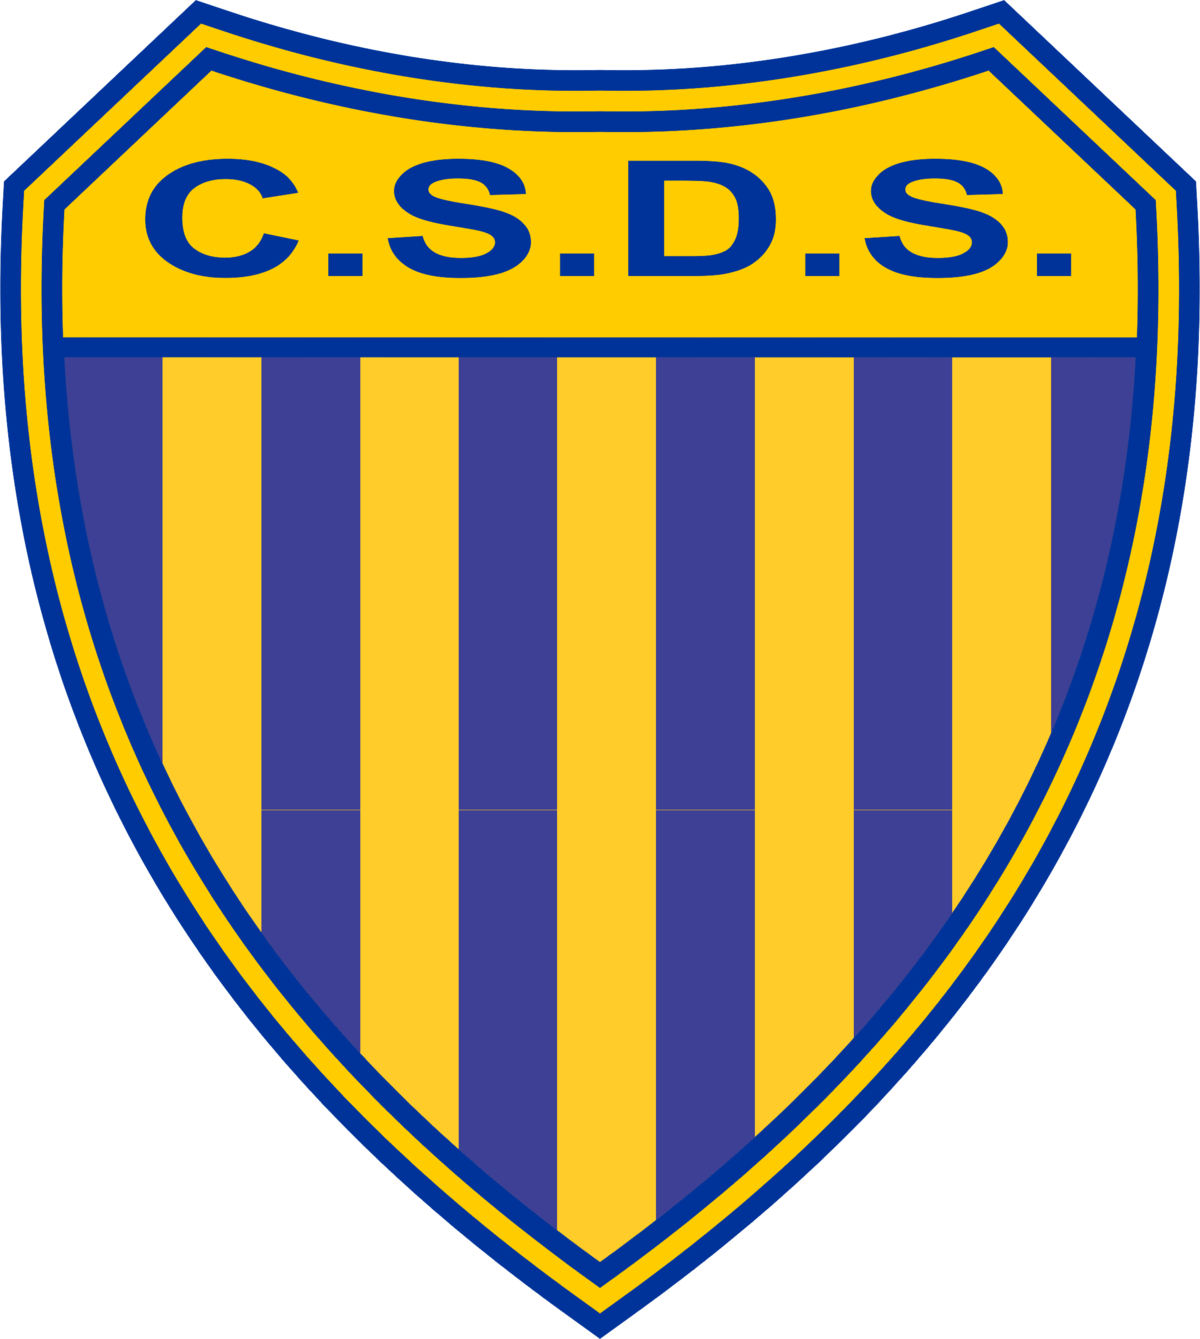 Dock Sud logo